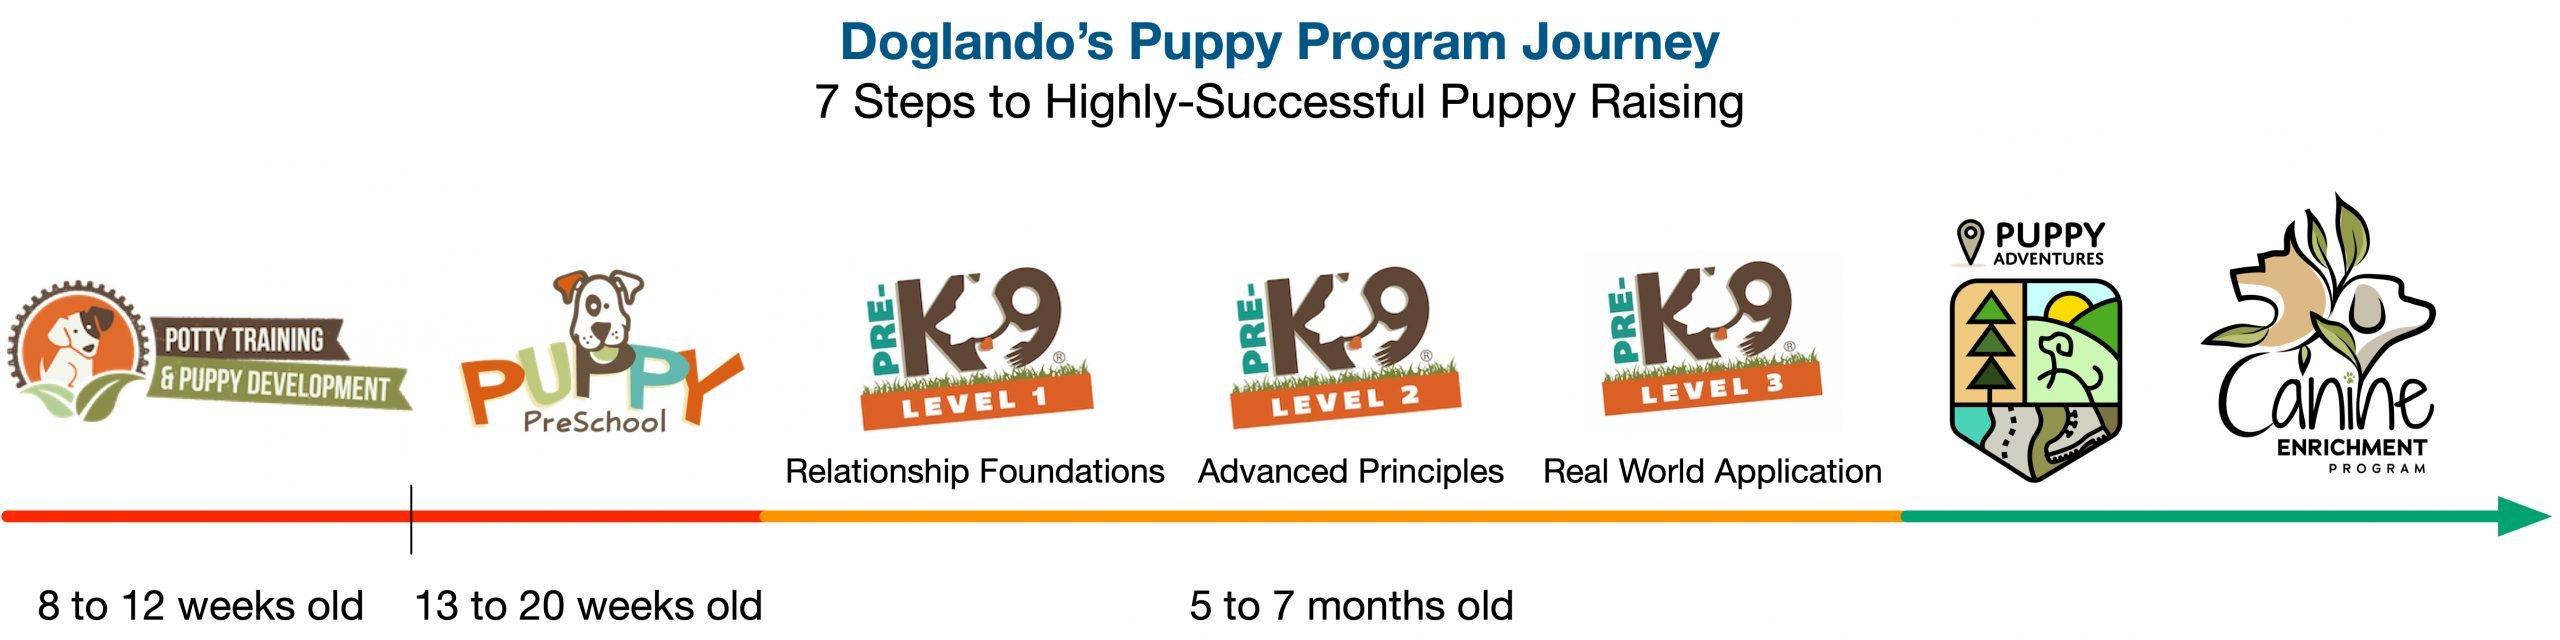 Puppy Program Journey